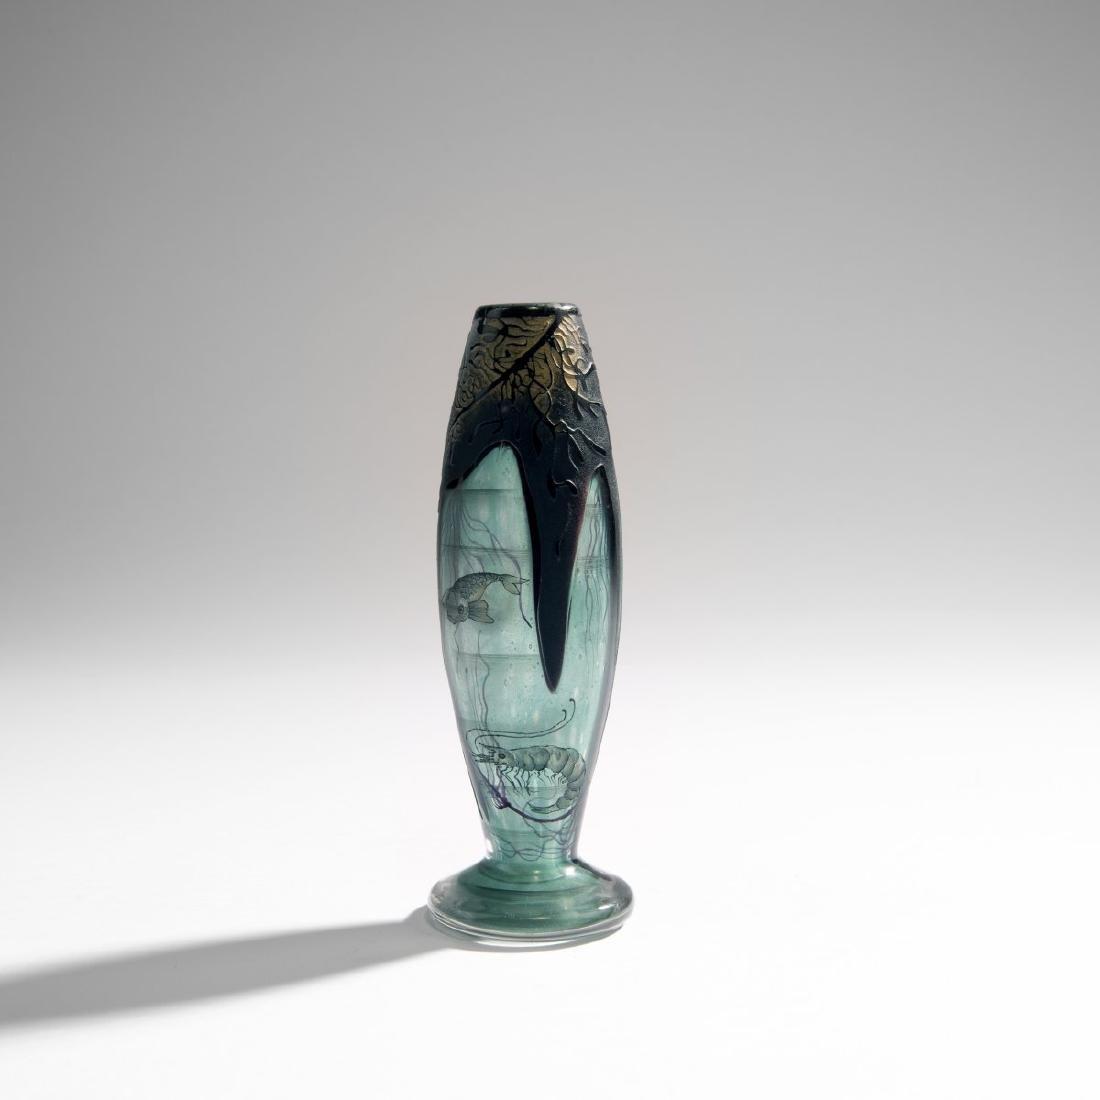 Daum Freres, 'Algues et Poissons' vase, 1898